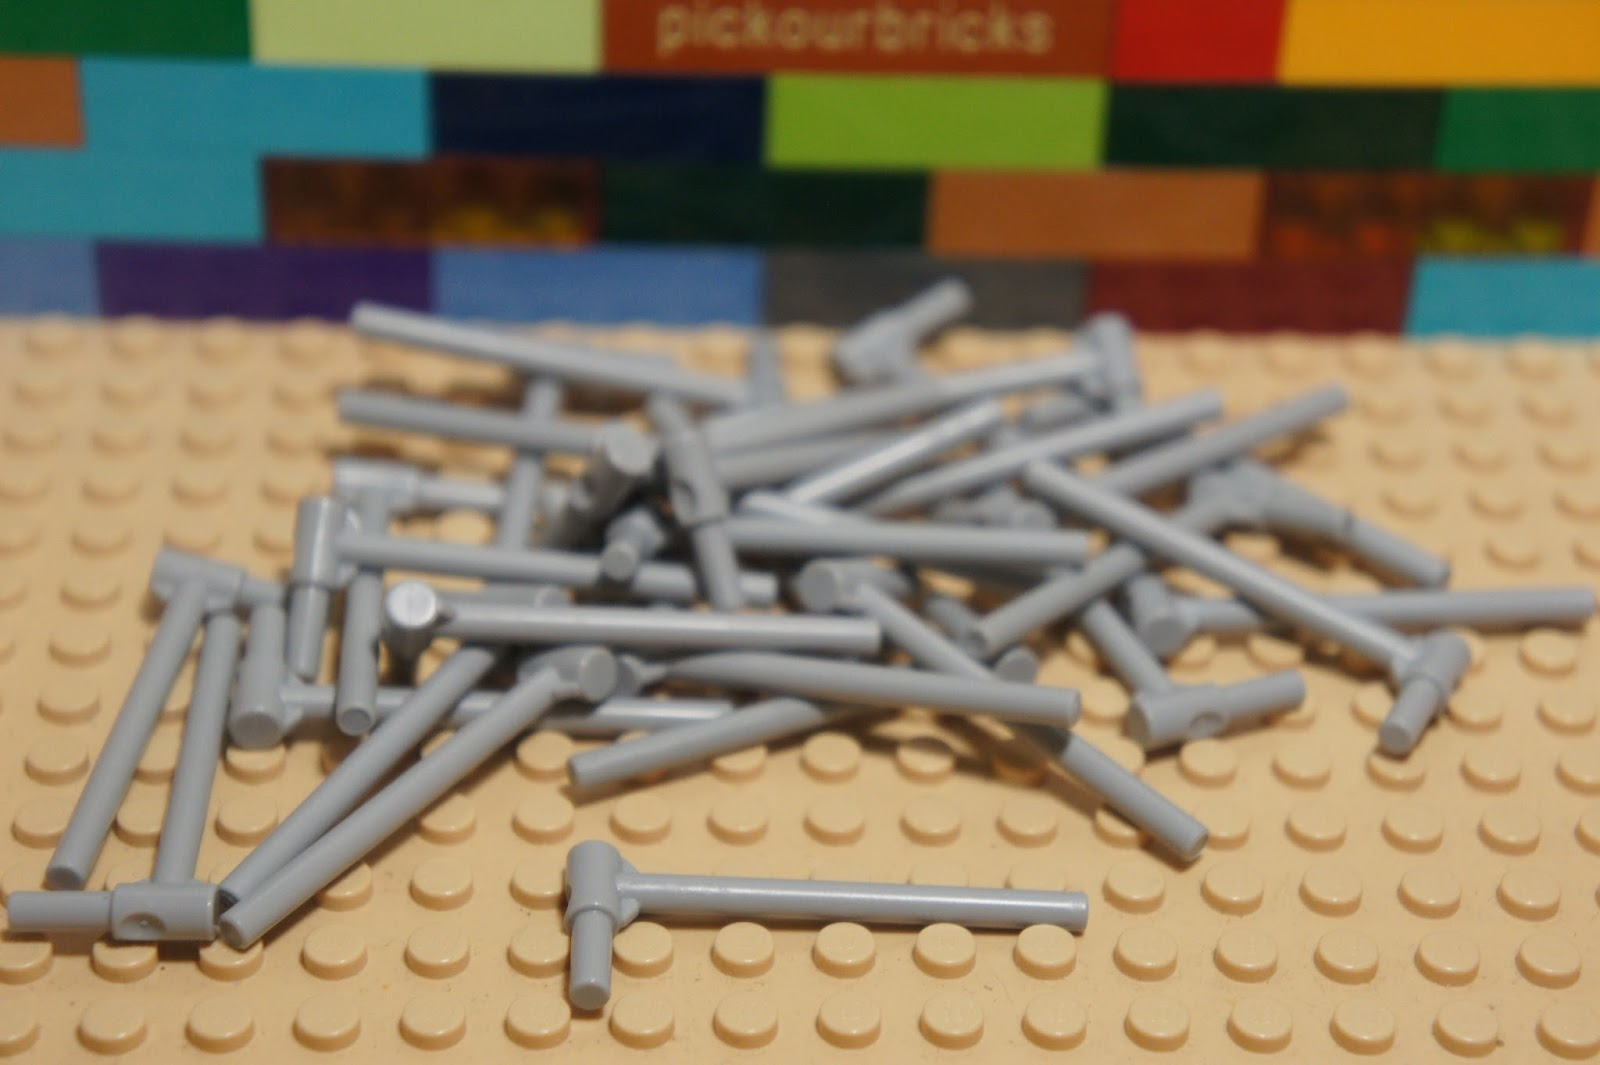 x1 Lego 87618-Bar 4.5L with handle